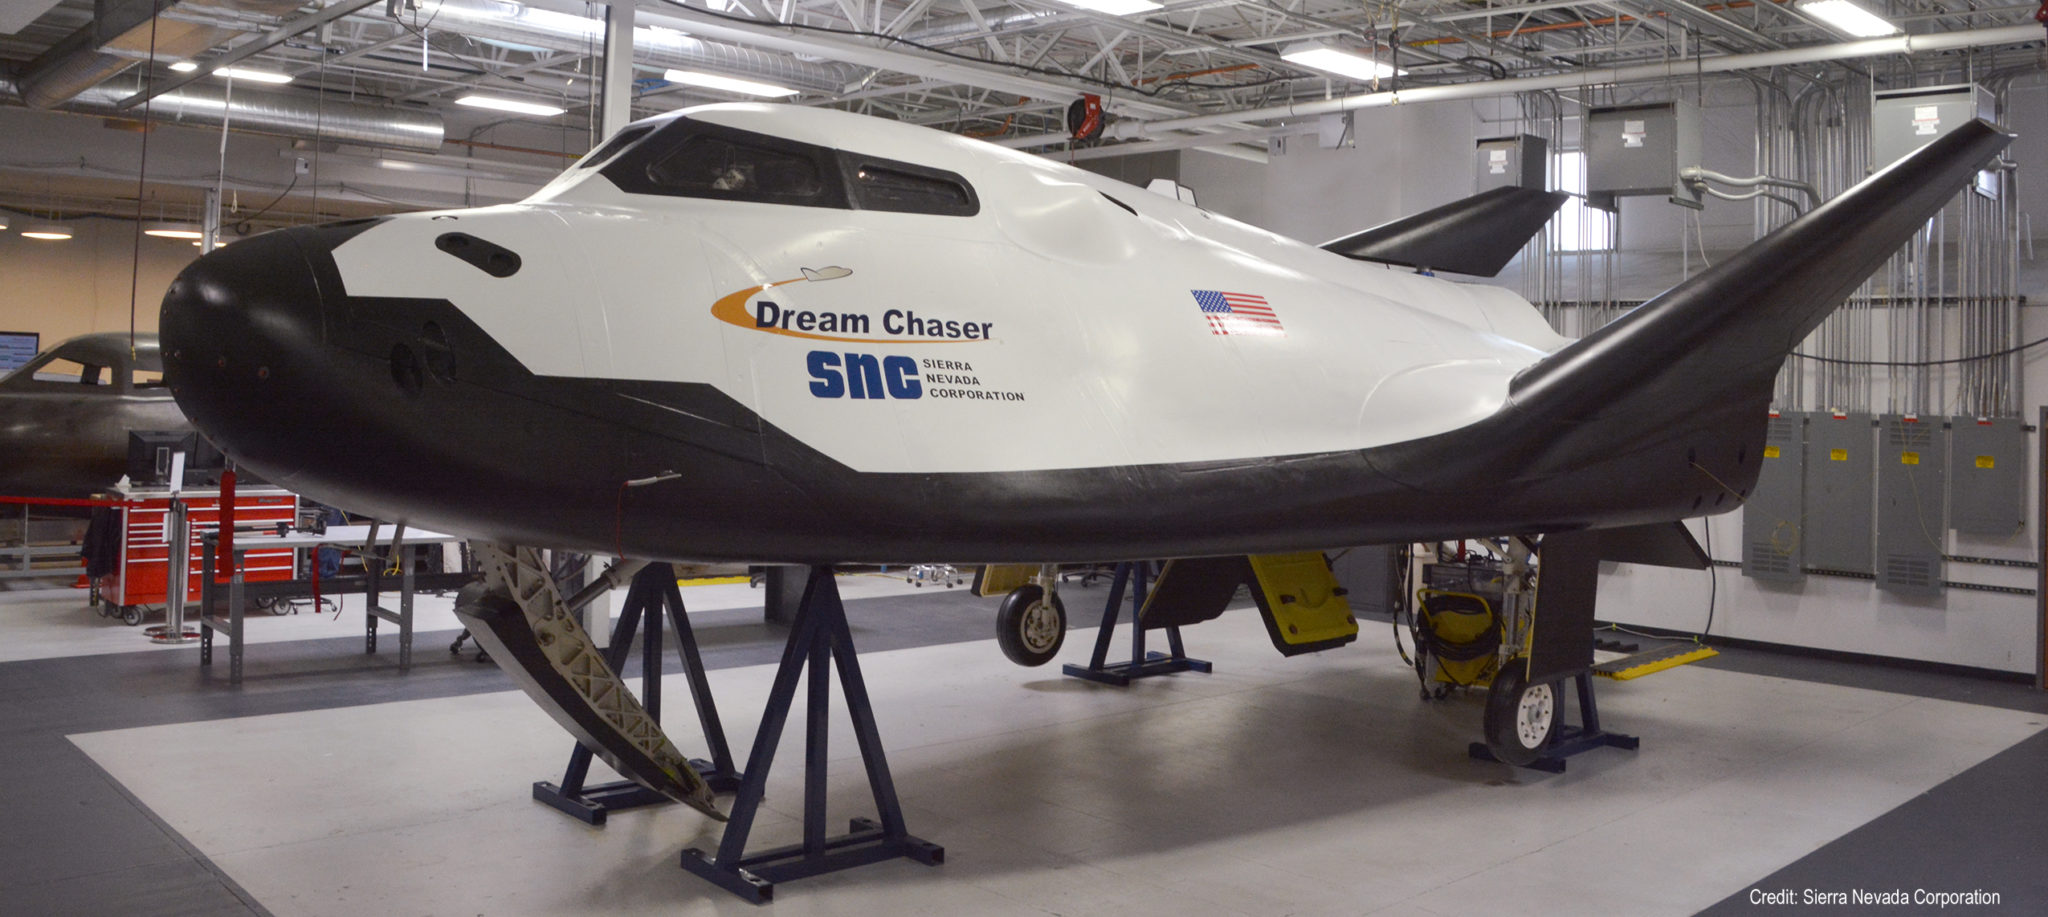 Dream Chaser SNC